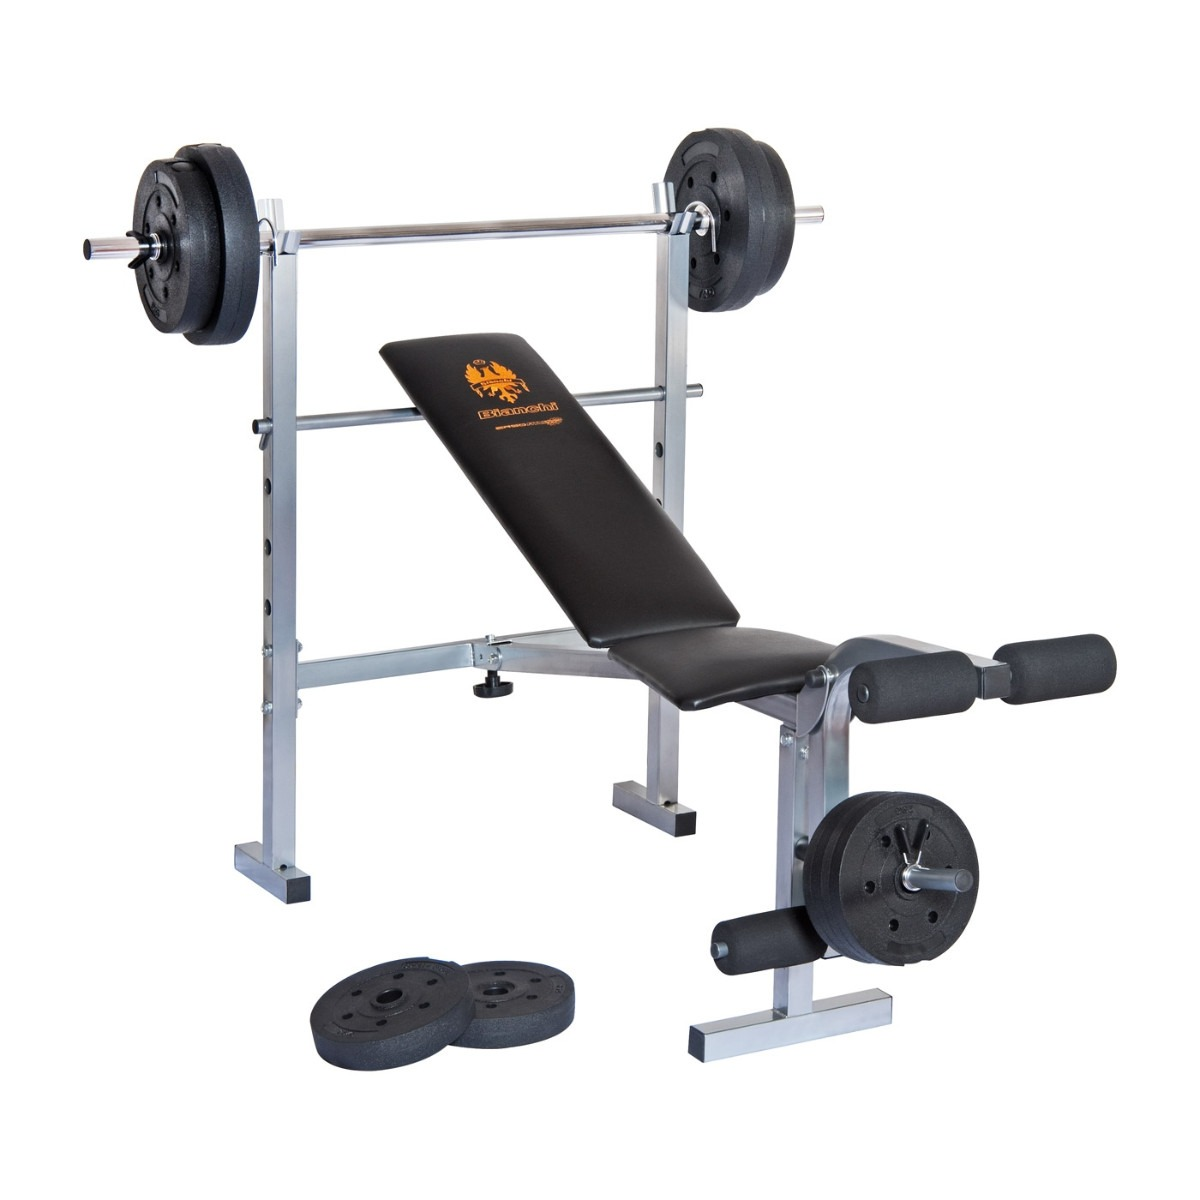 Arma tu gym en tu propia casa culturismo superior for Aparatos para gimnasio